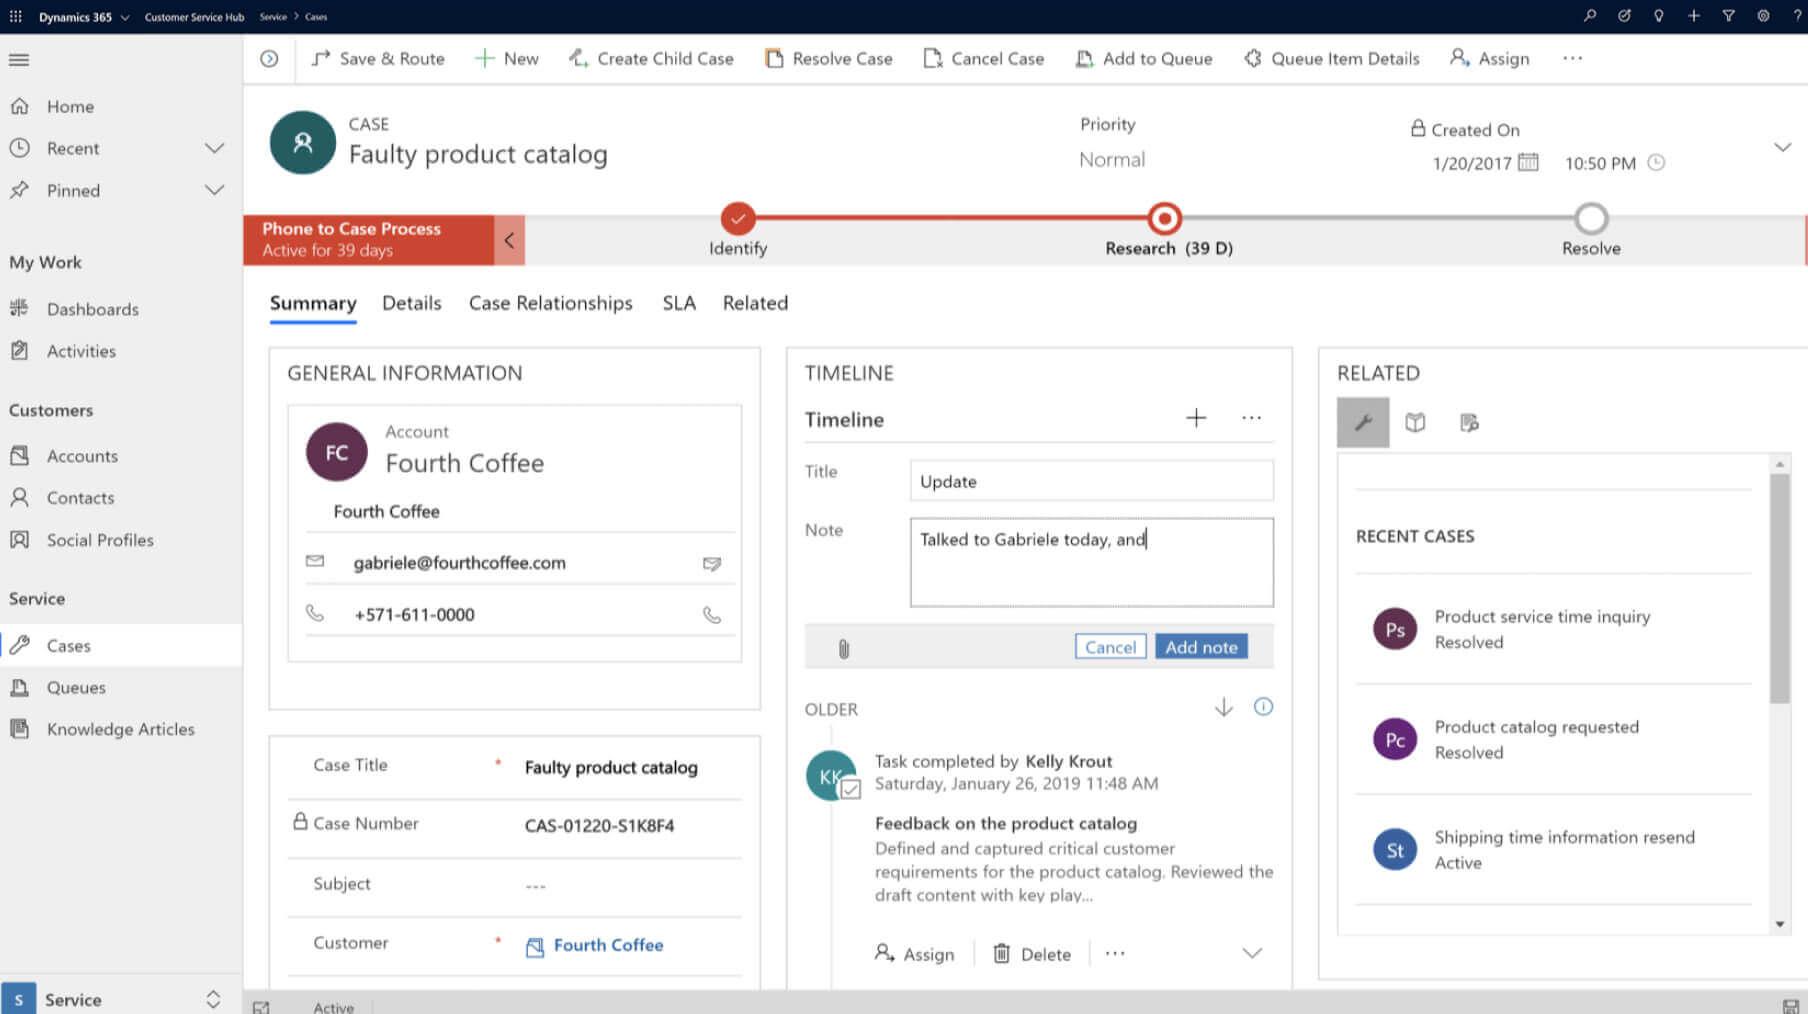 Customer Service Professional | Microsoft Dynamics 365